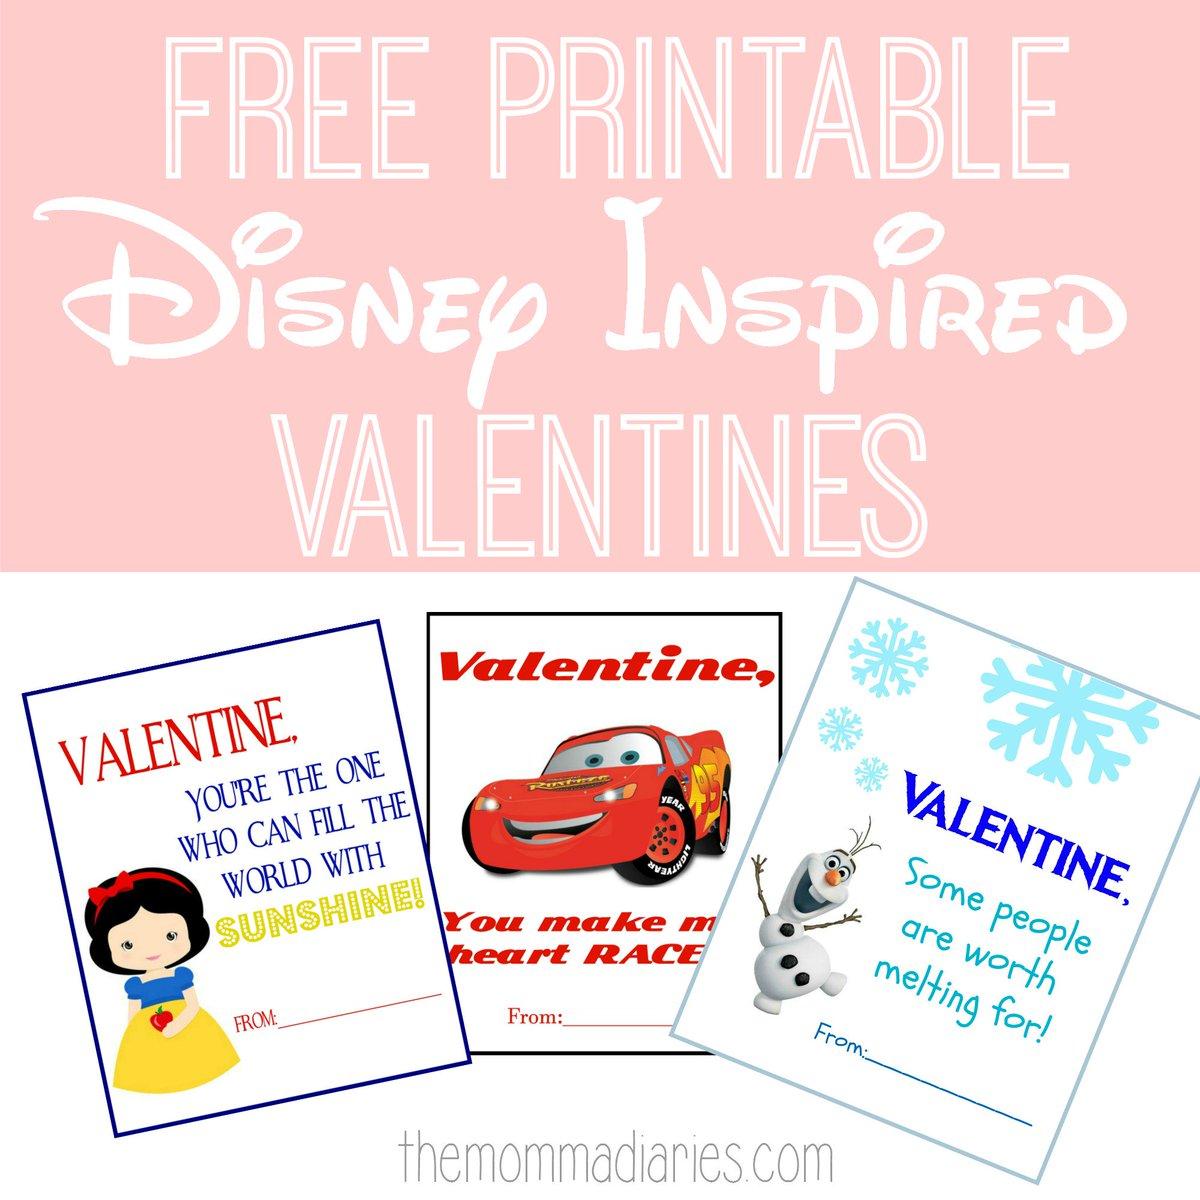 Free Printable Disney Inspired Valentines are up on the blog today!  http:// bit.ly/2iRVlAI  &nbsp;   #DisneySMMC #DisneySide #DisneyKids<br>http://pic.twitter.com/aPbY0O6Do9